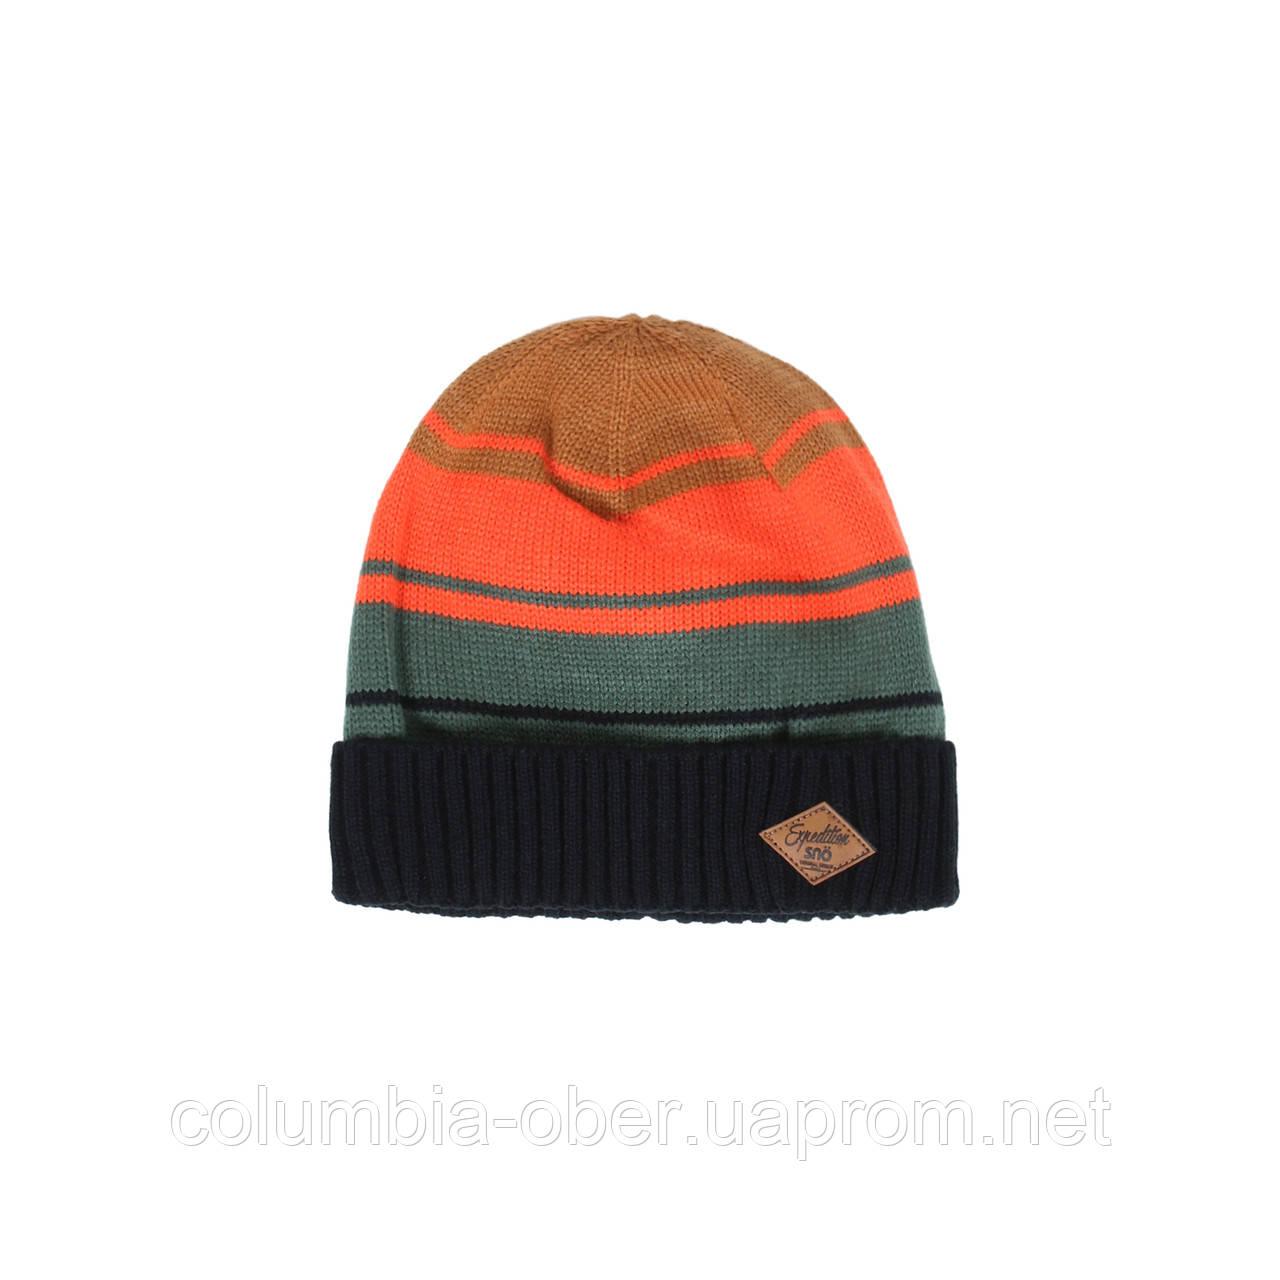 Зимняя шапка для мальчика SNO F18TU307 BLACK. Размер 54/56.